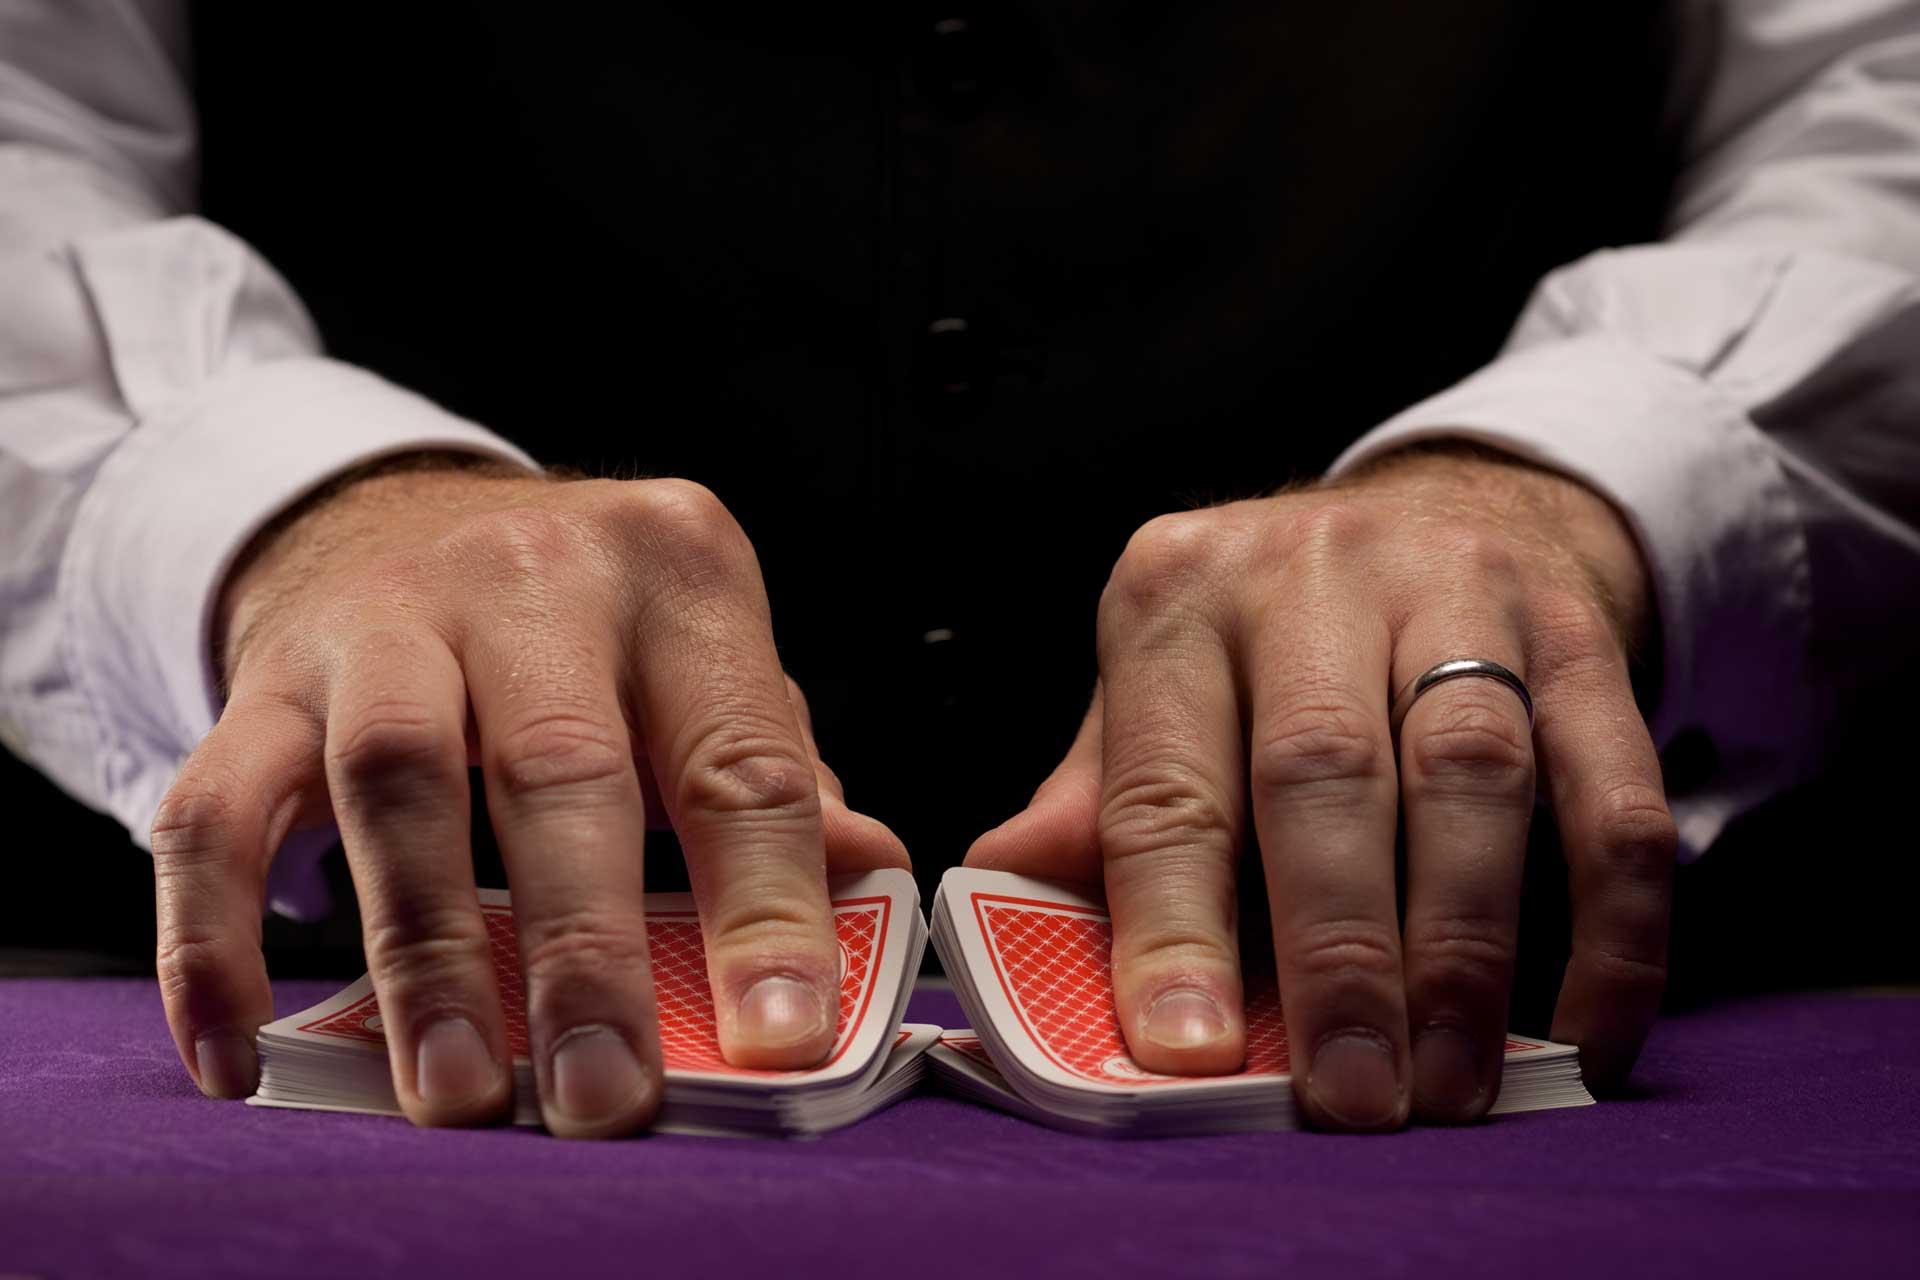 A poker dealer shuffling cards on a table